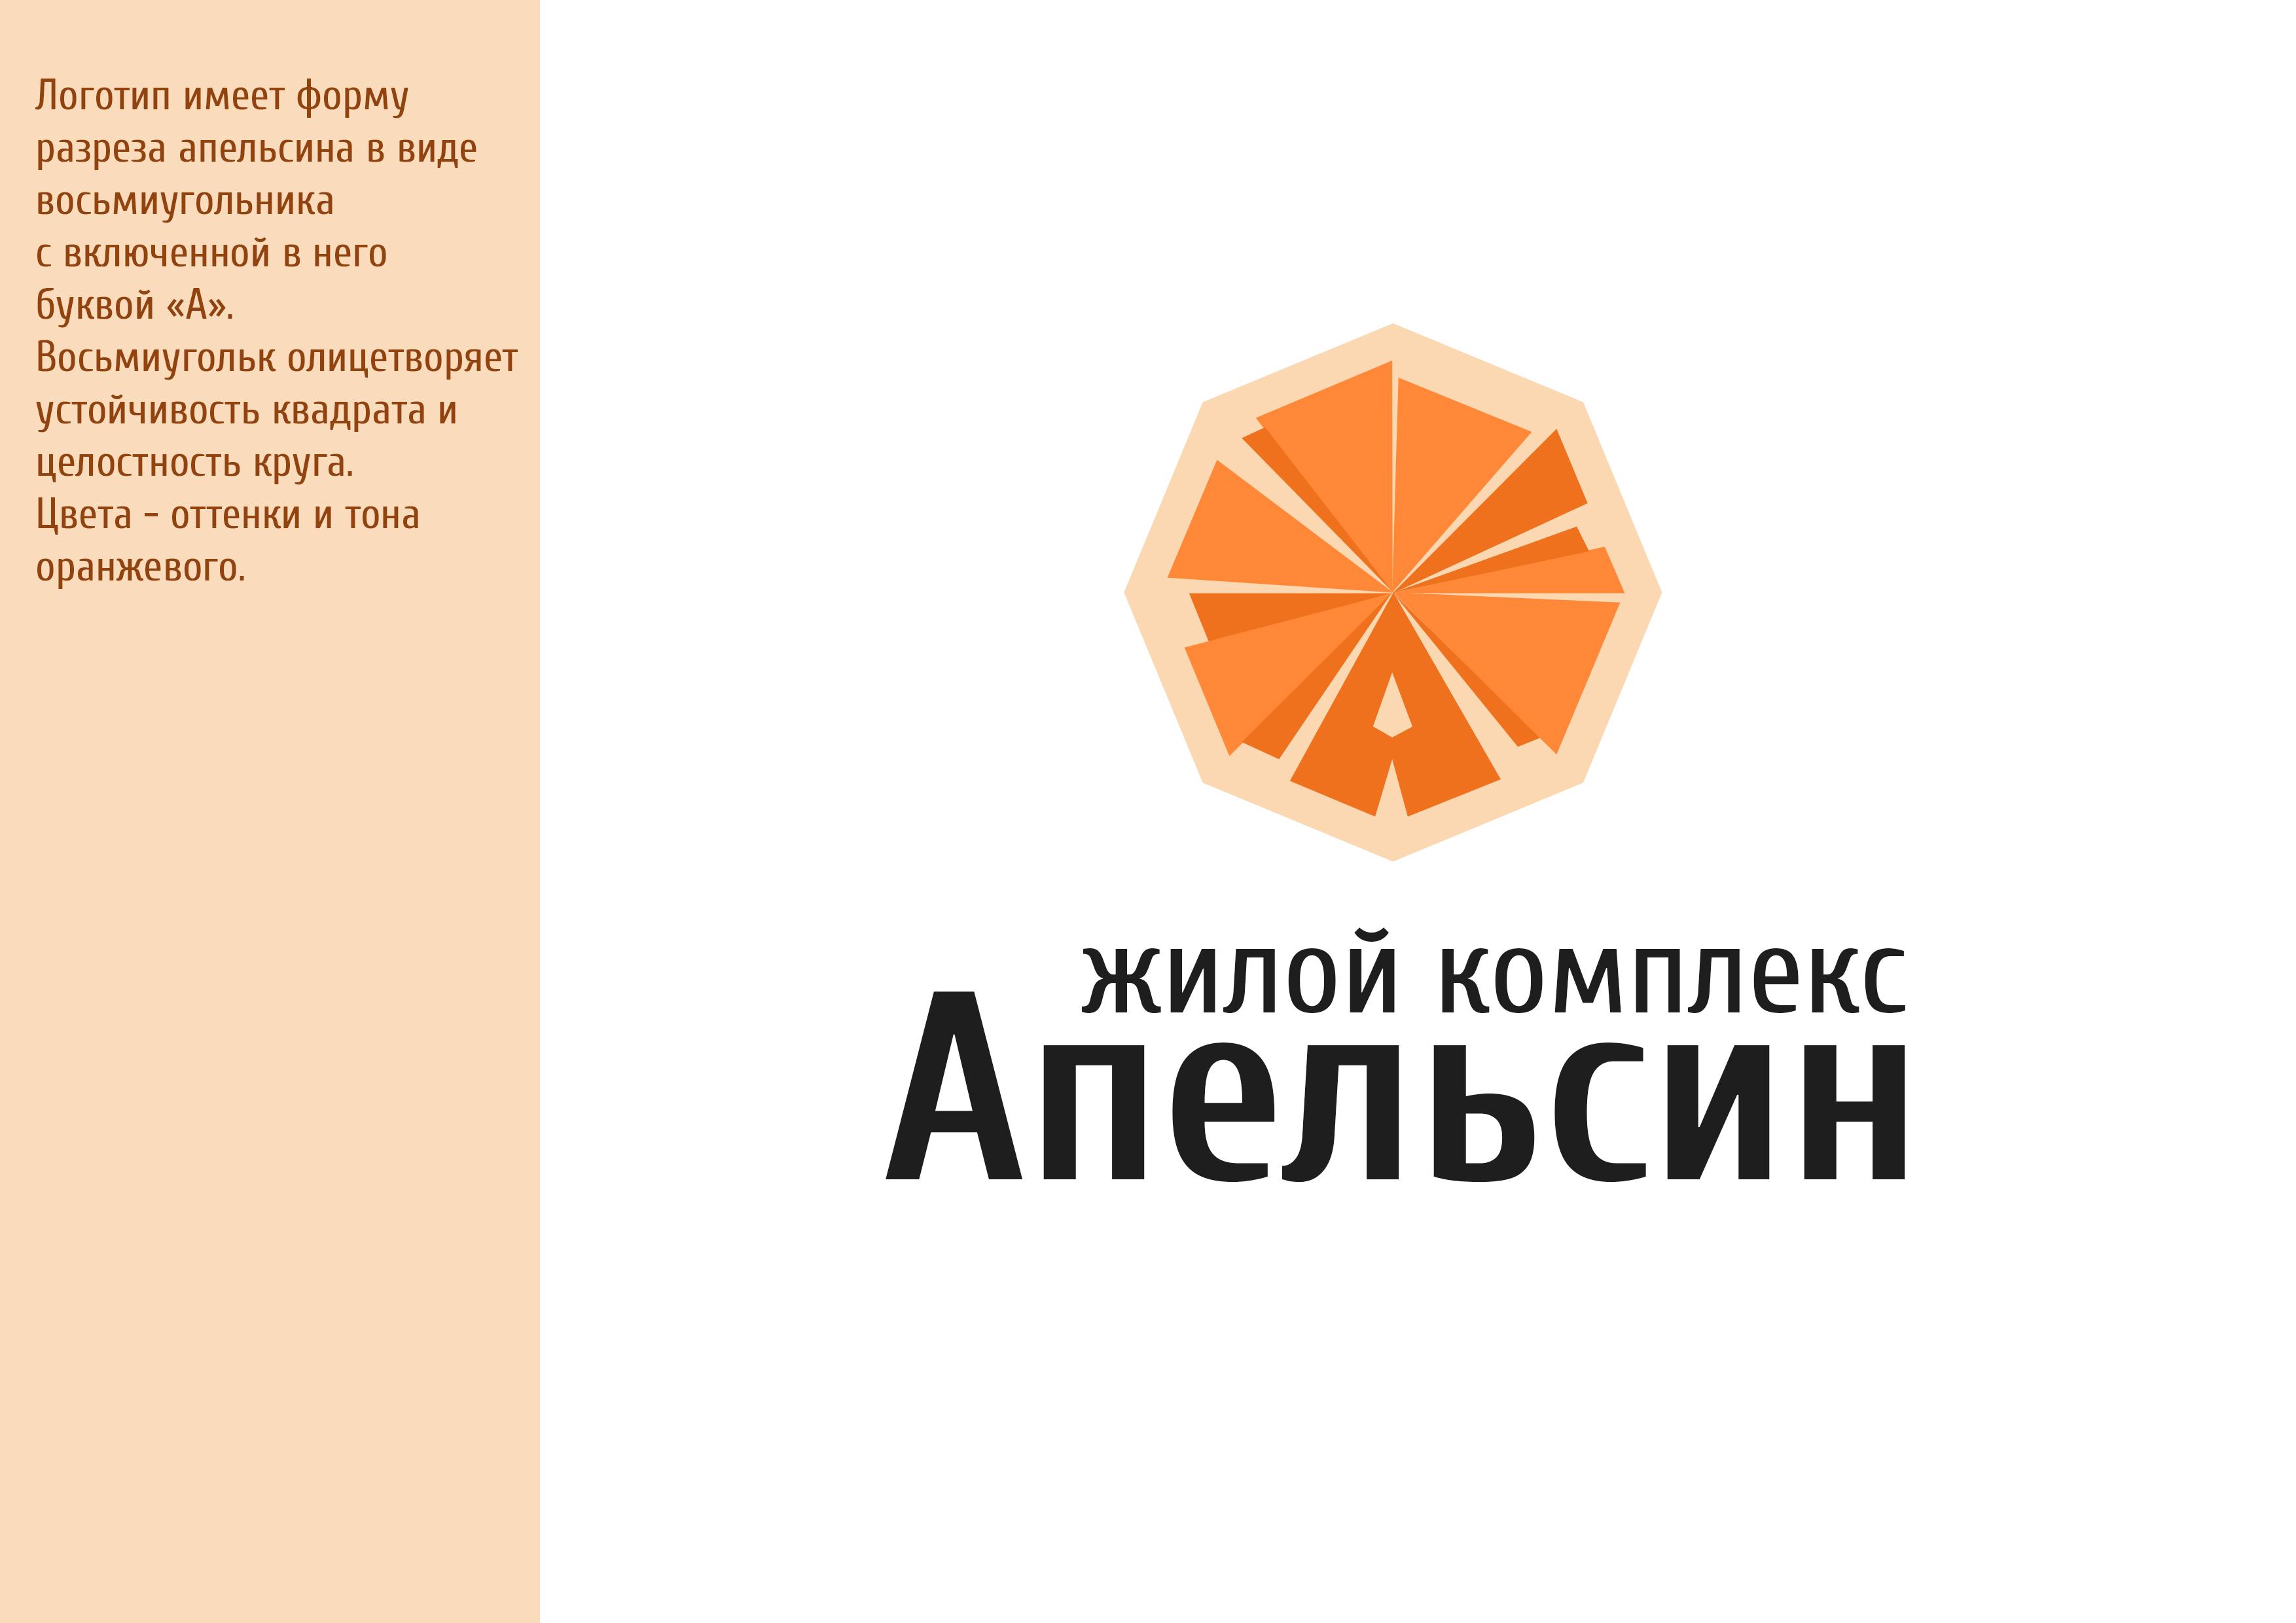 Логотип и фирменный стиль фото f_7985a633f1571ba6.jpg